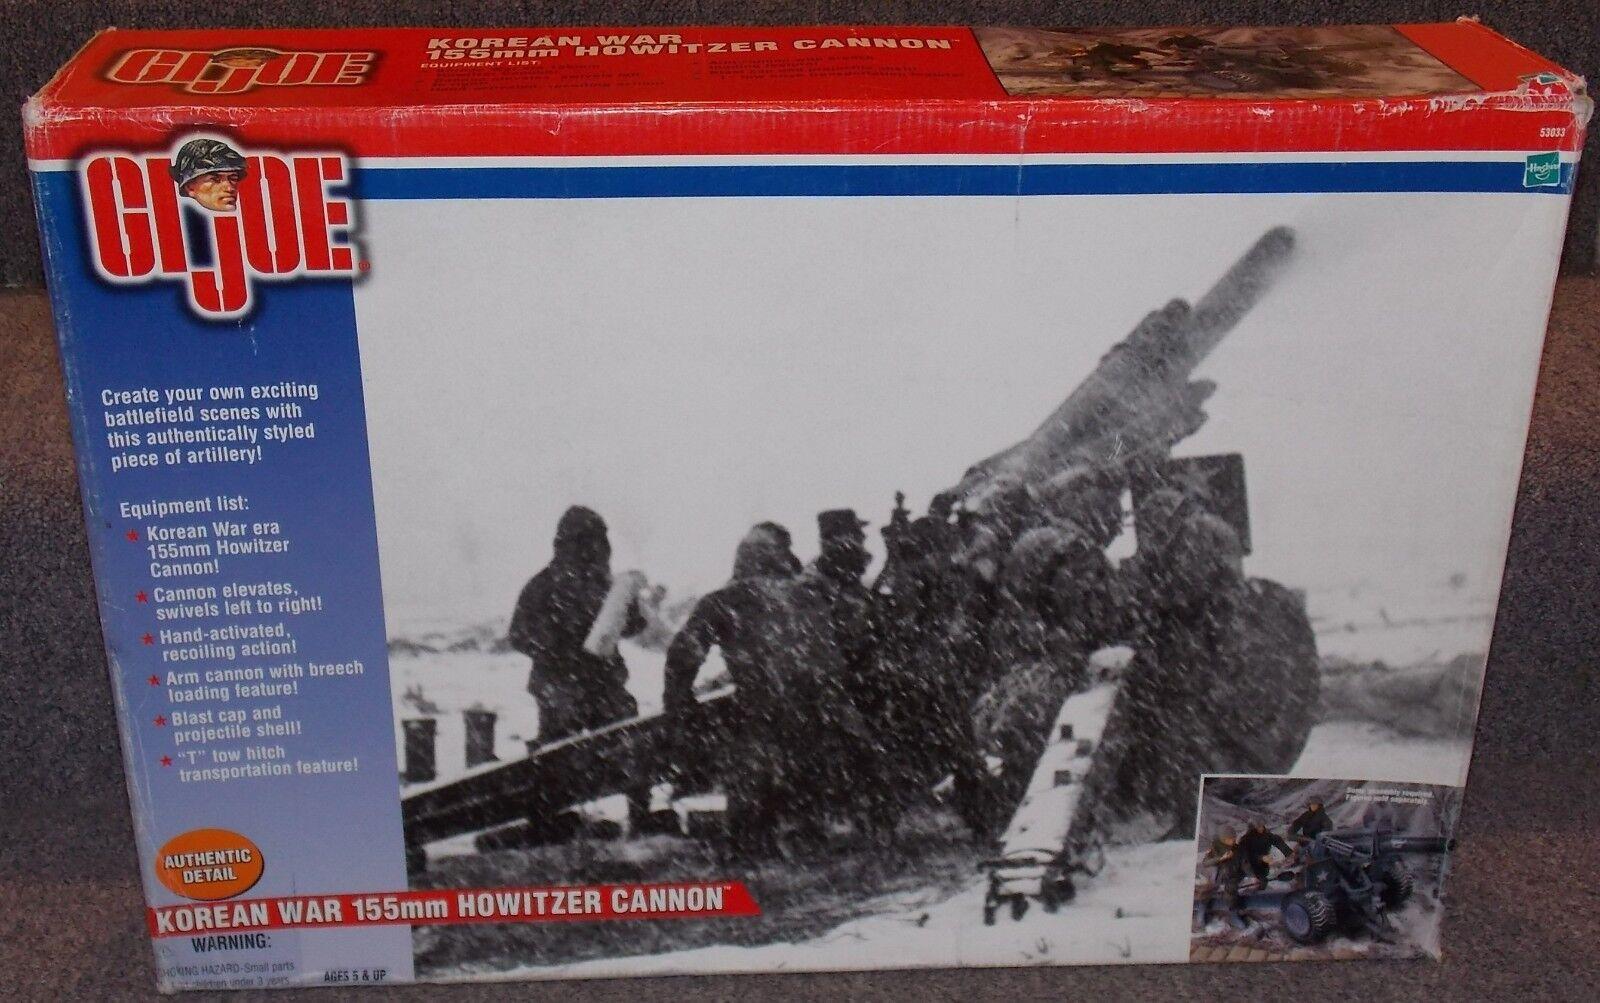 Hasbro 2001 GI Joe la guerra coreana 155 mm Howitzer Cannon in the scatola 1 6th Scale